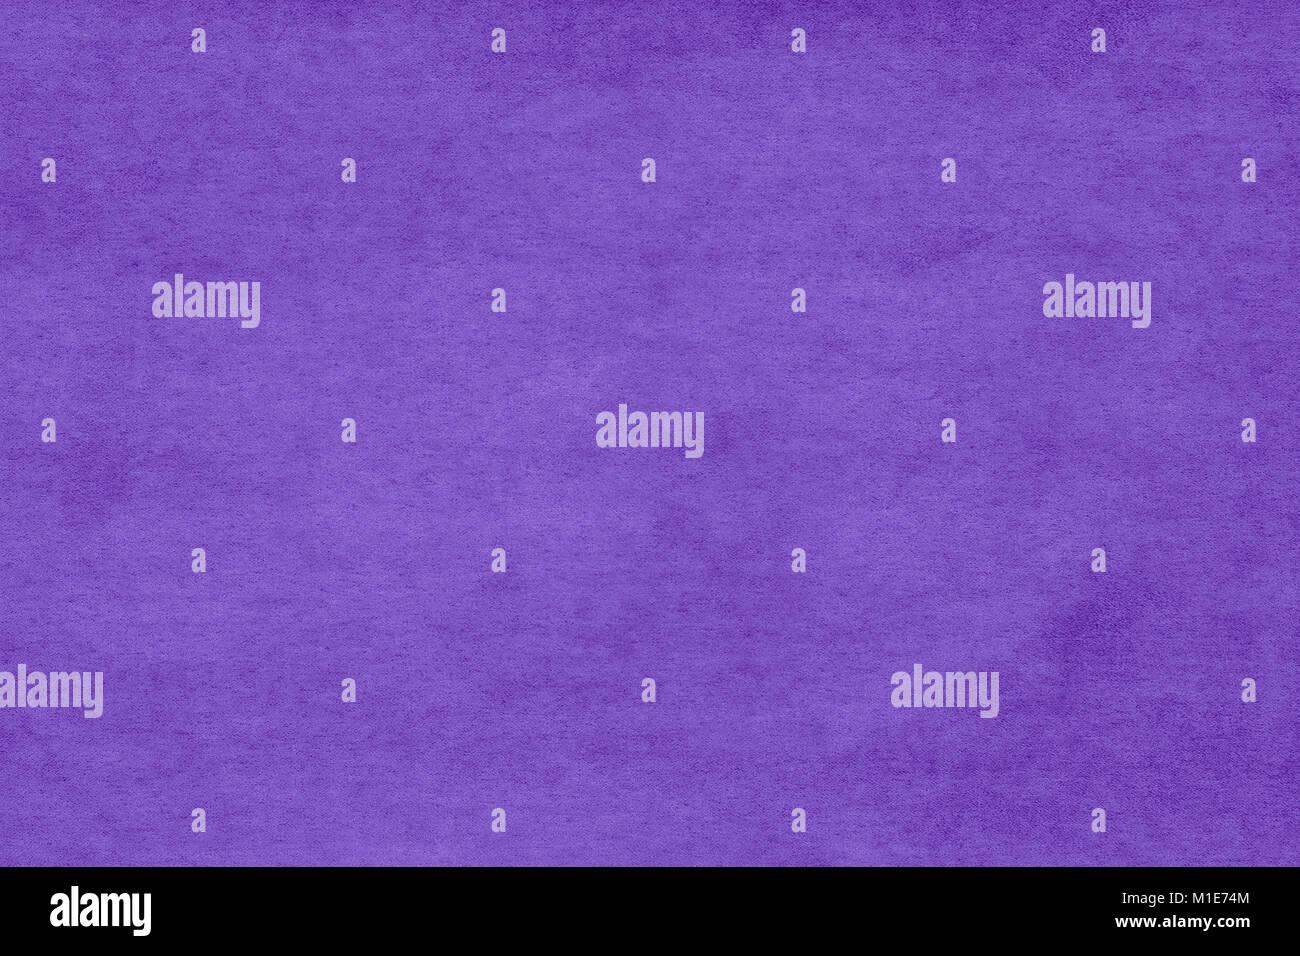 resumo prpura sentiu fundo fundo de veludo roxo imagens stock purple carpet texture84 purple